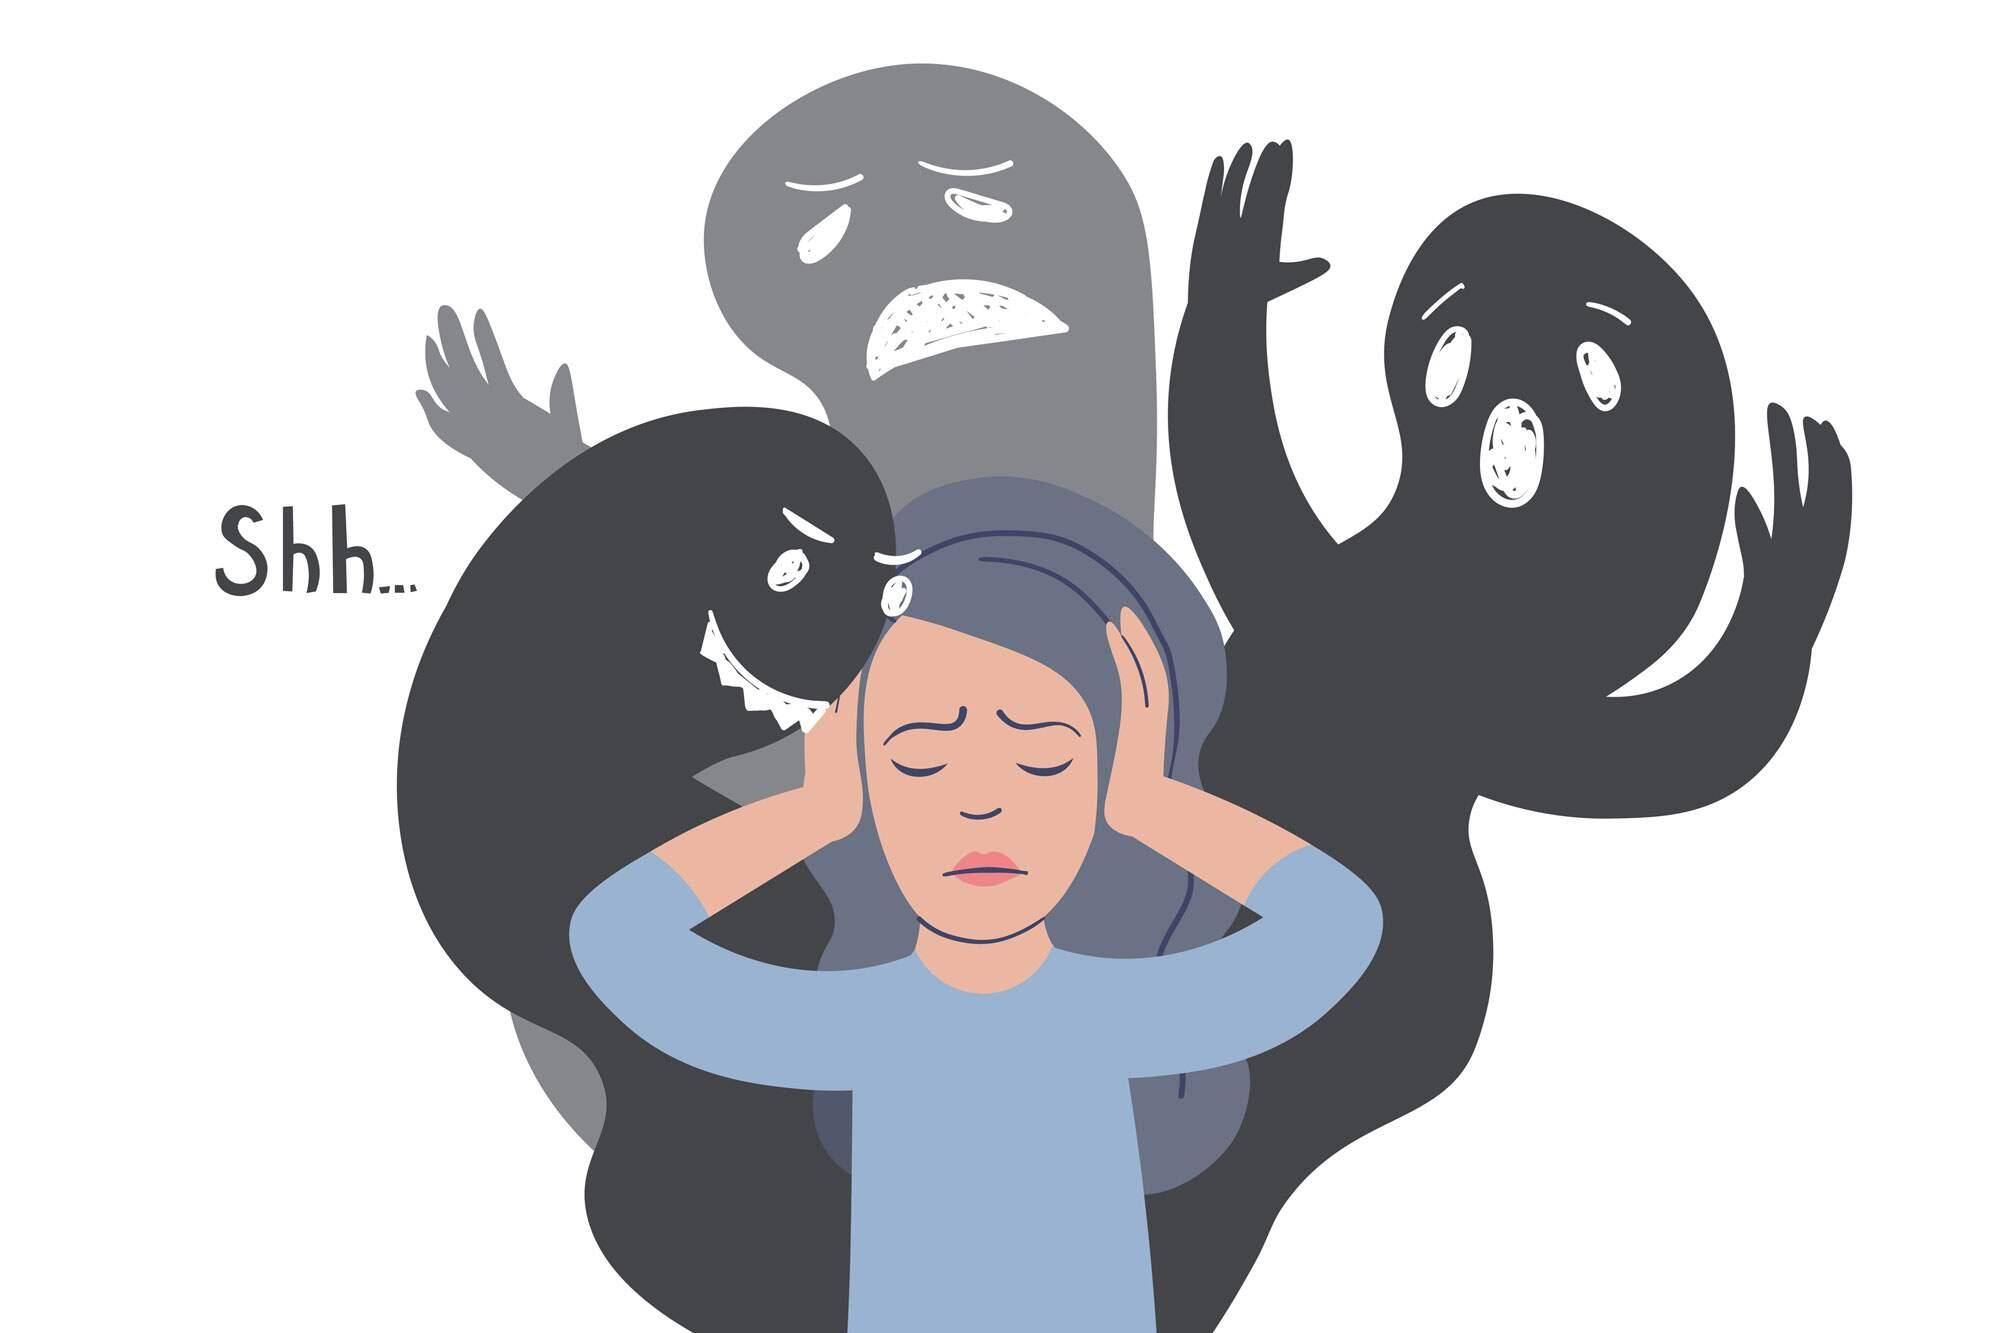 esquizofrenia e transtorno bipolar saiba como diferenciar